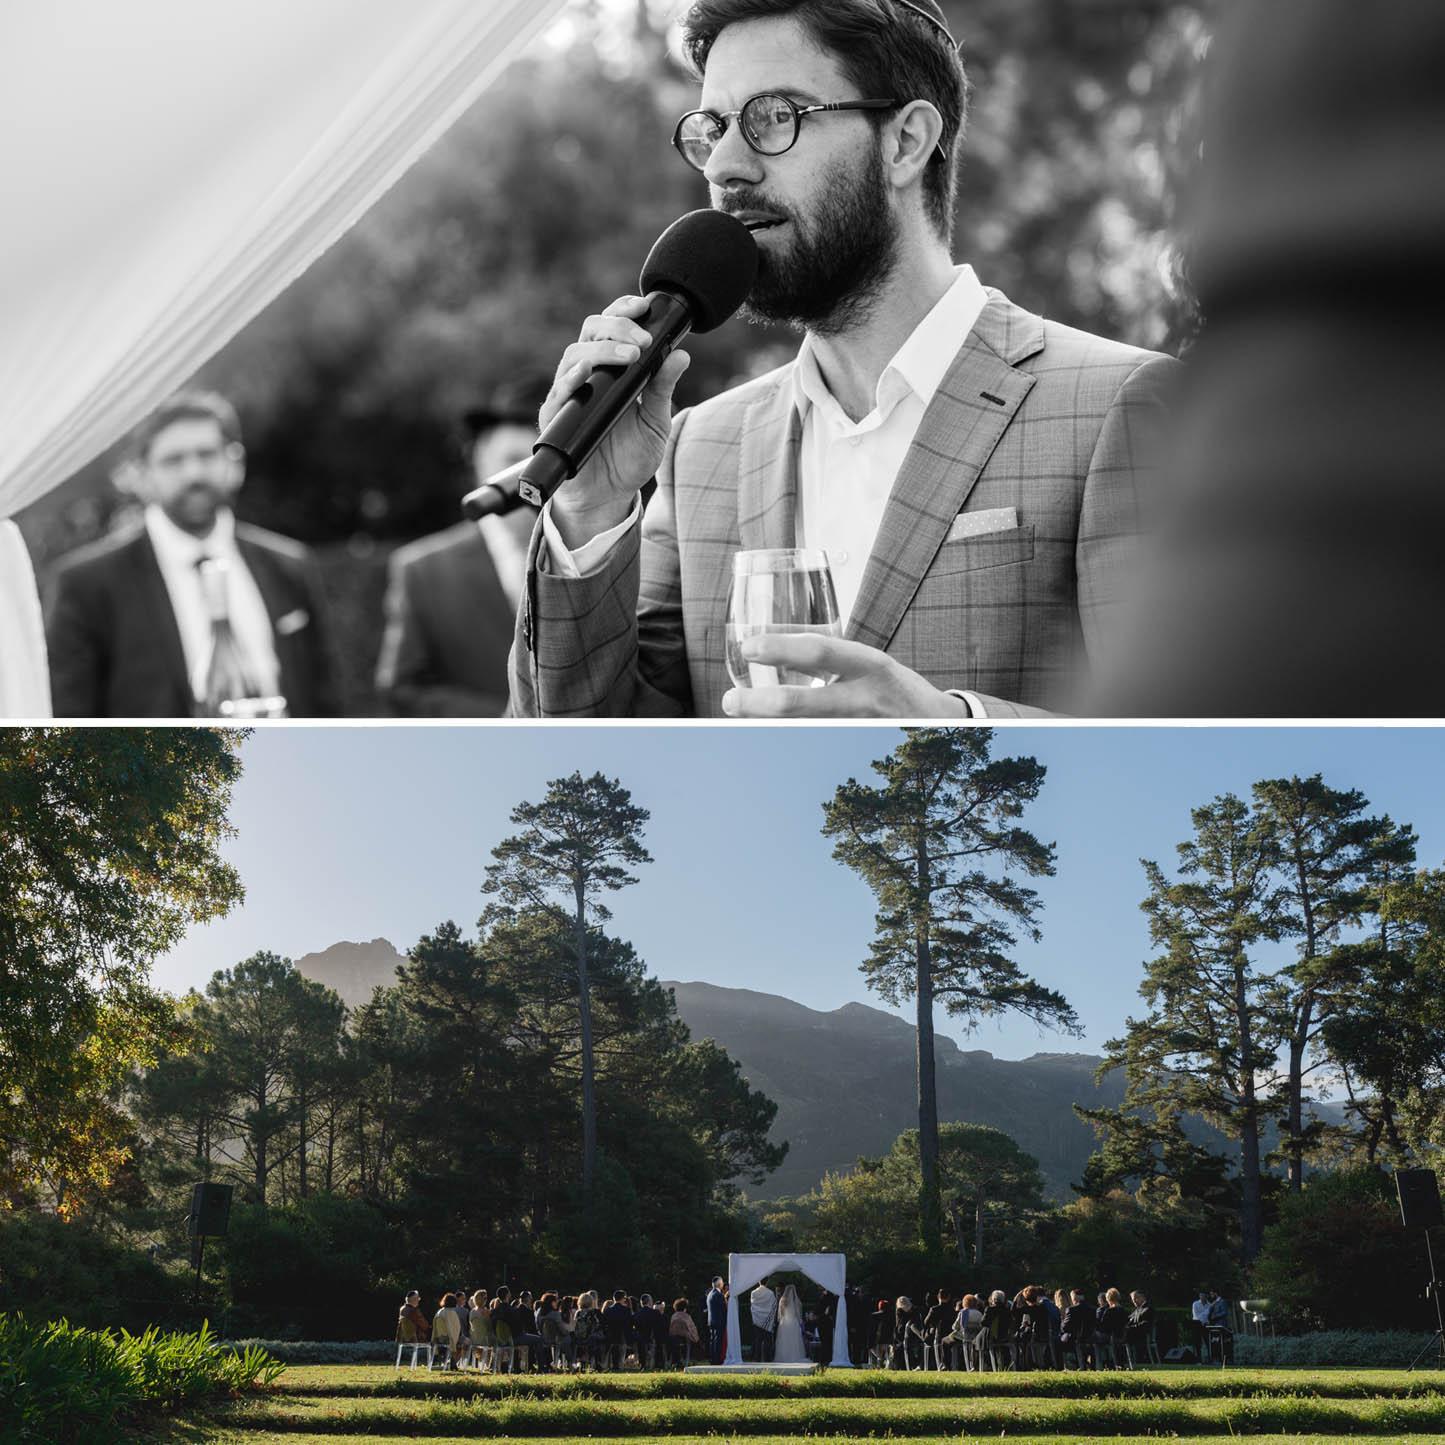 Leon_&_Martine's_Wedding_Photographs_17th_April_2019_@johnhenryweddingphoto_Low_Resolution_Web-308-1.jpg